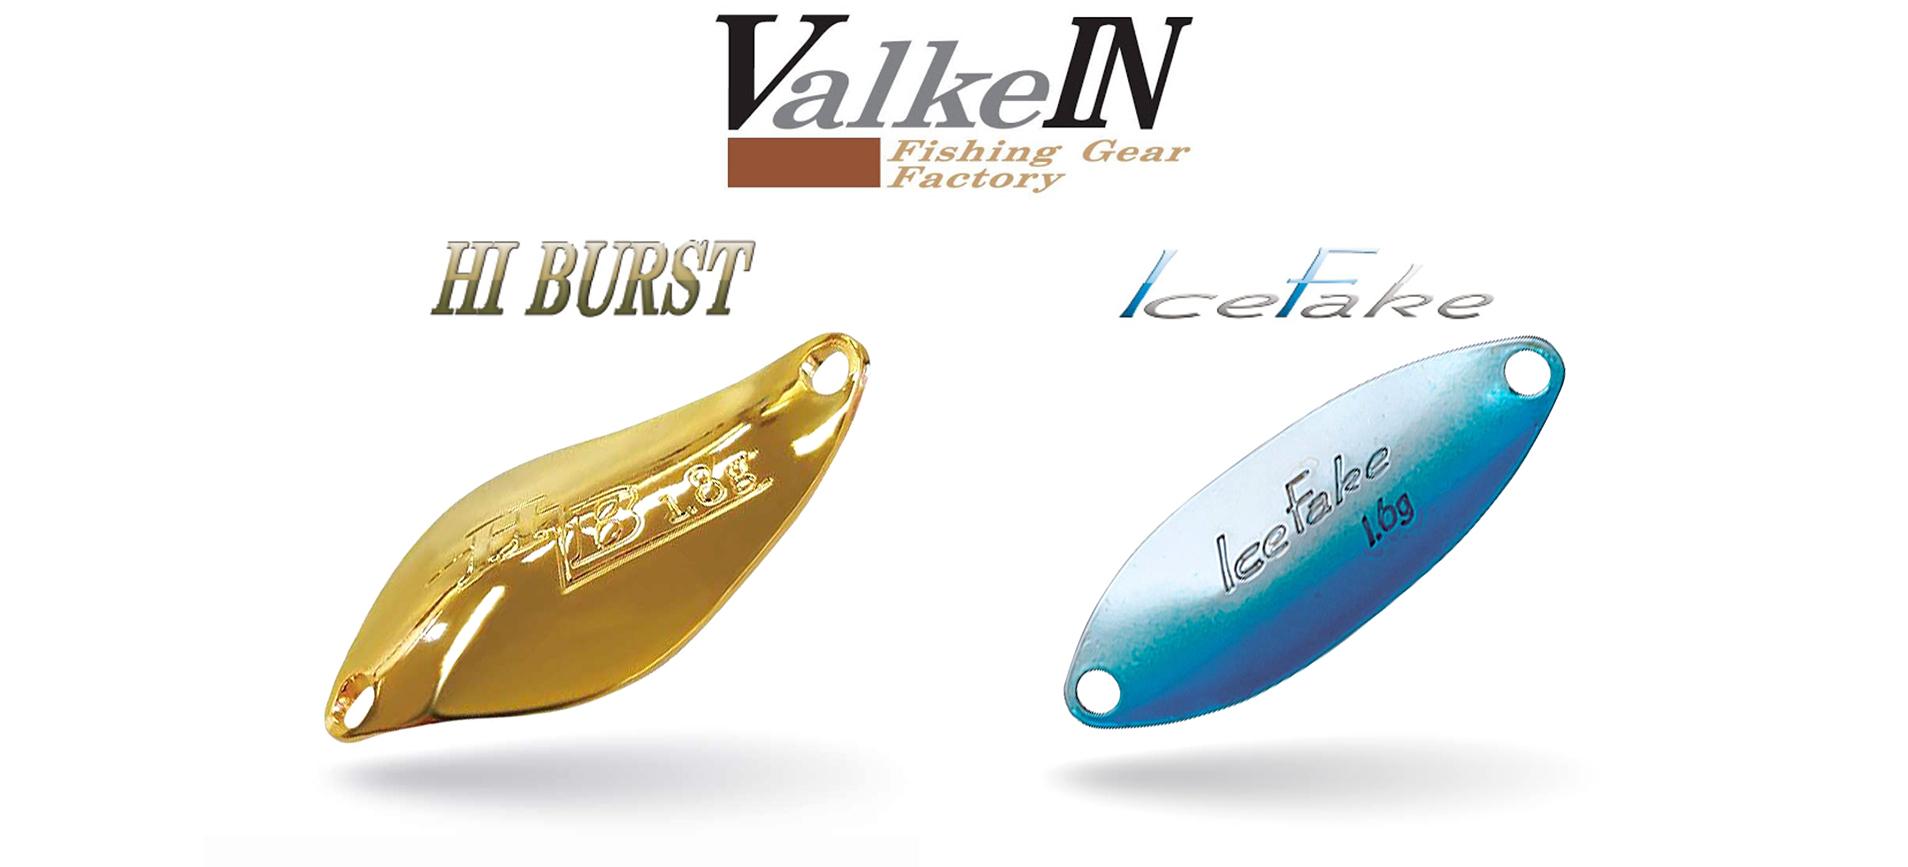 ValkeIN Hi Burst, Icefake